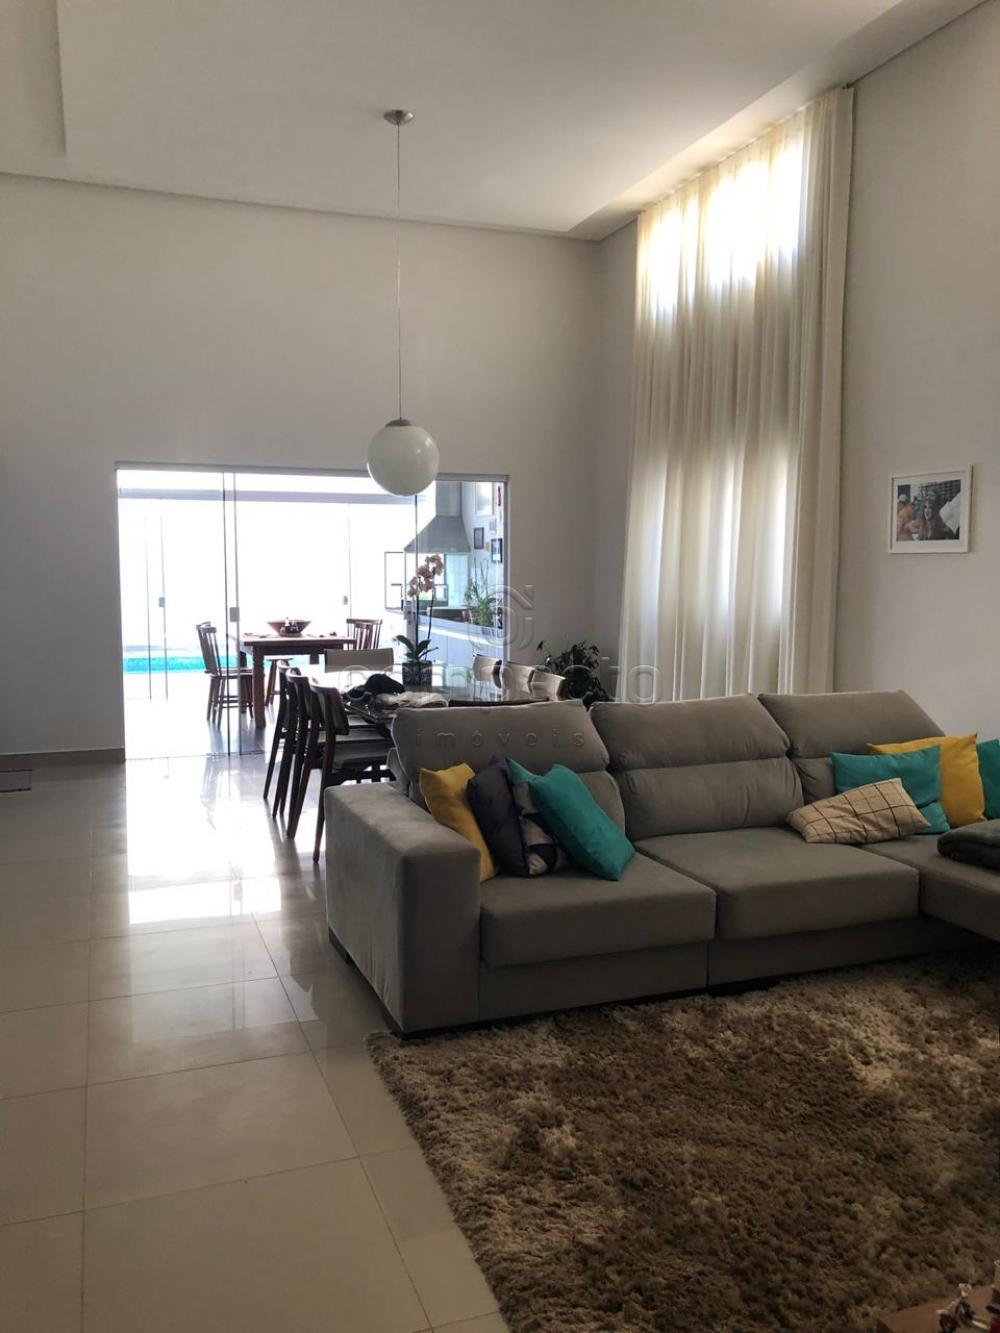 Comprar Casa / Condomínio em Bauru apenas R$ 850.000,00 - Foto 1